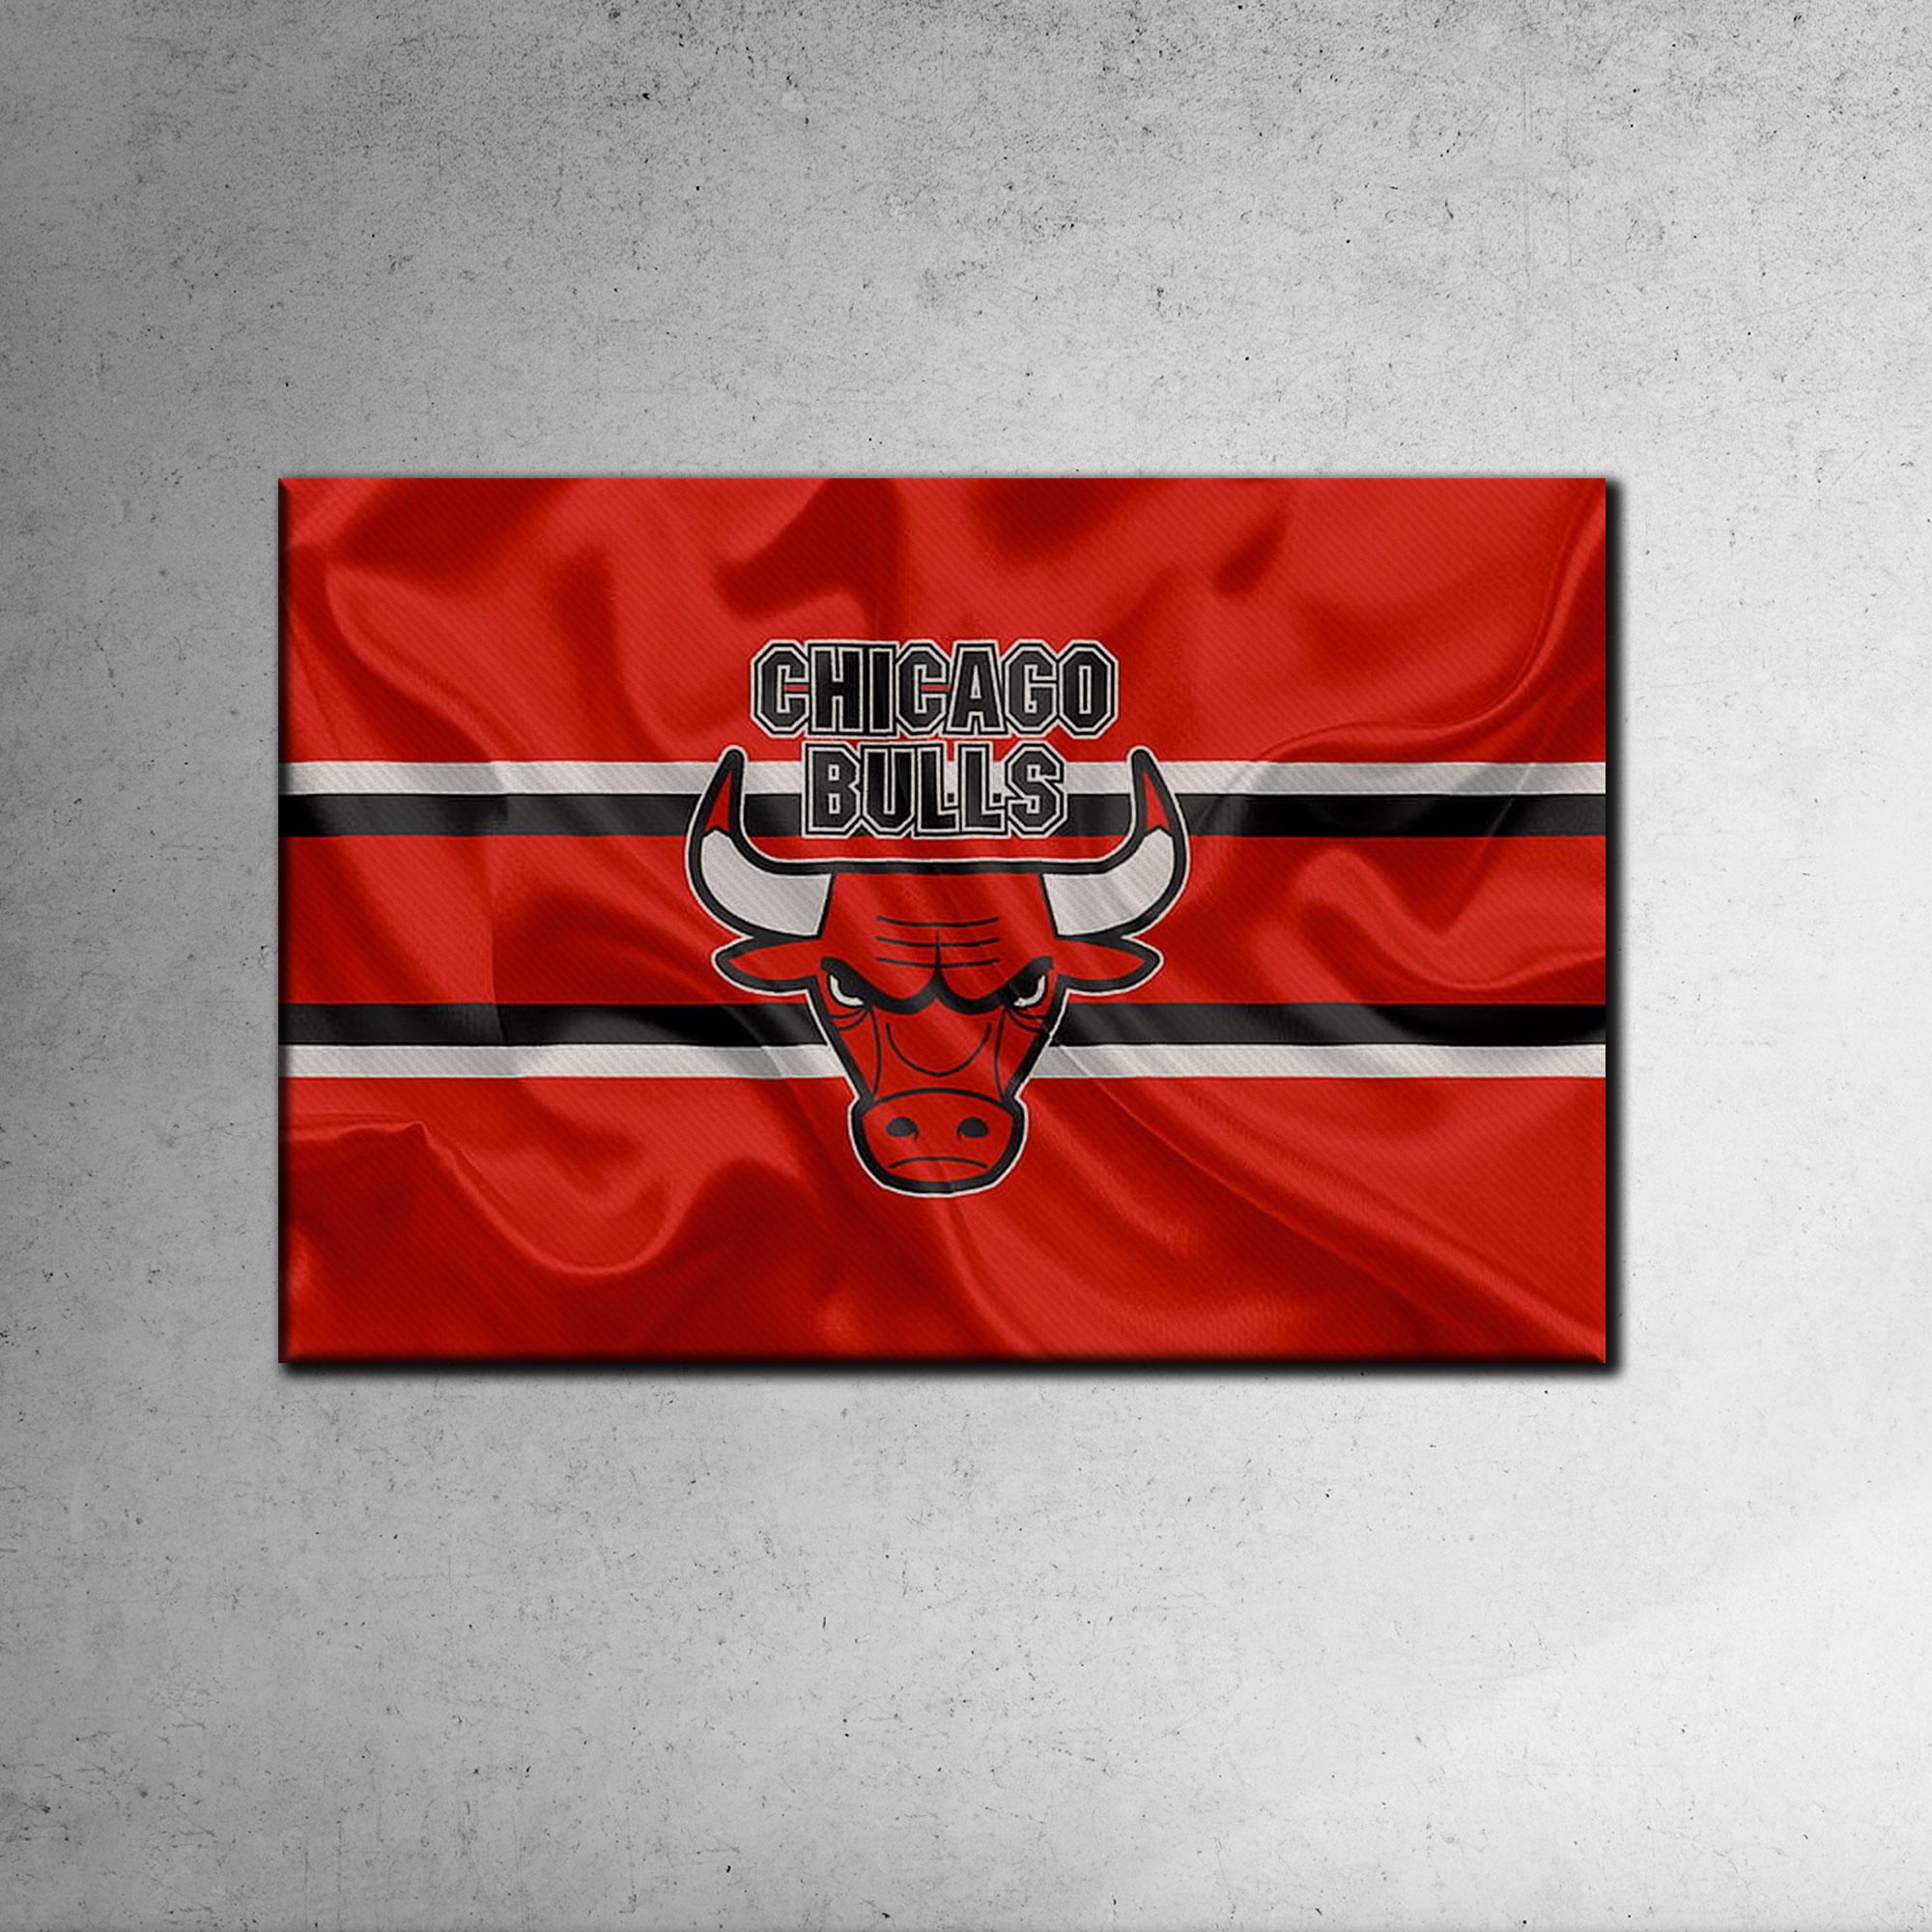 Chicago Bulls Canvas Tablo (Nba-canvas-bulls1)